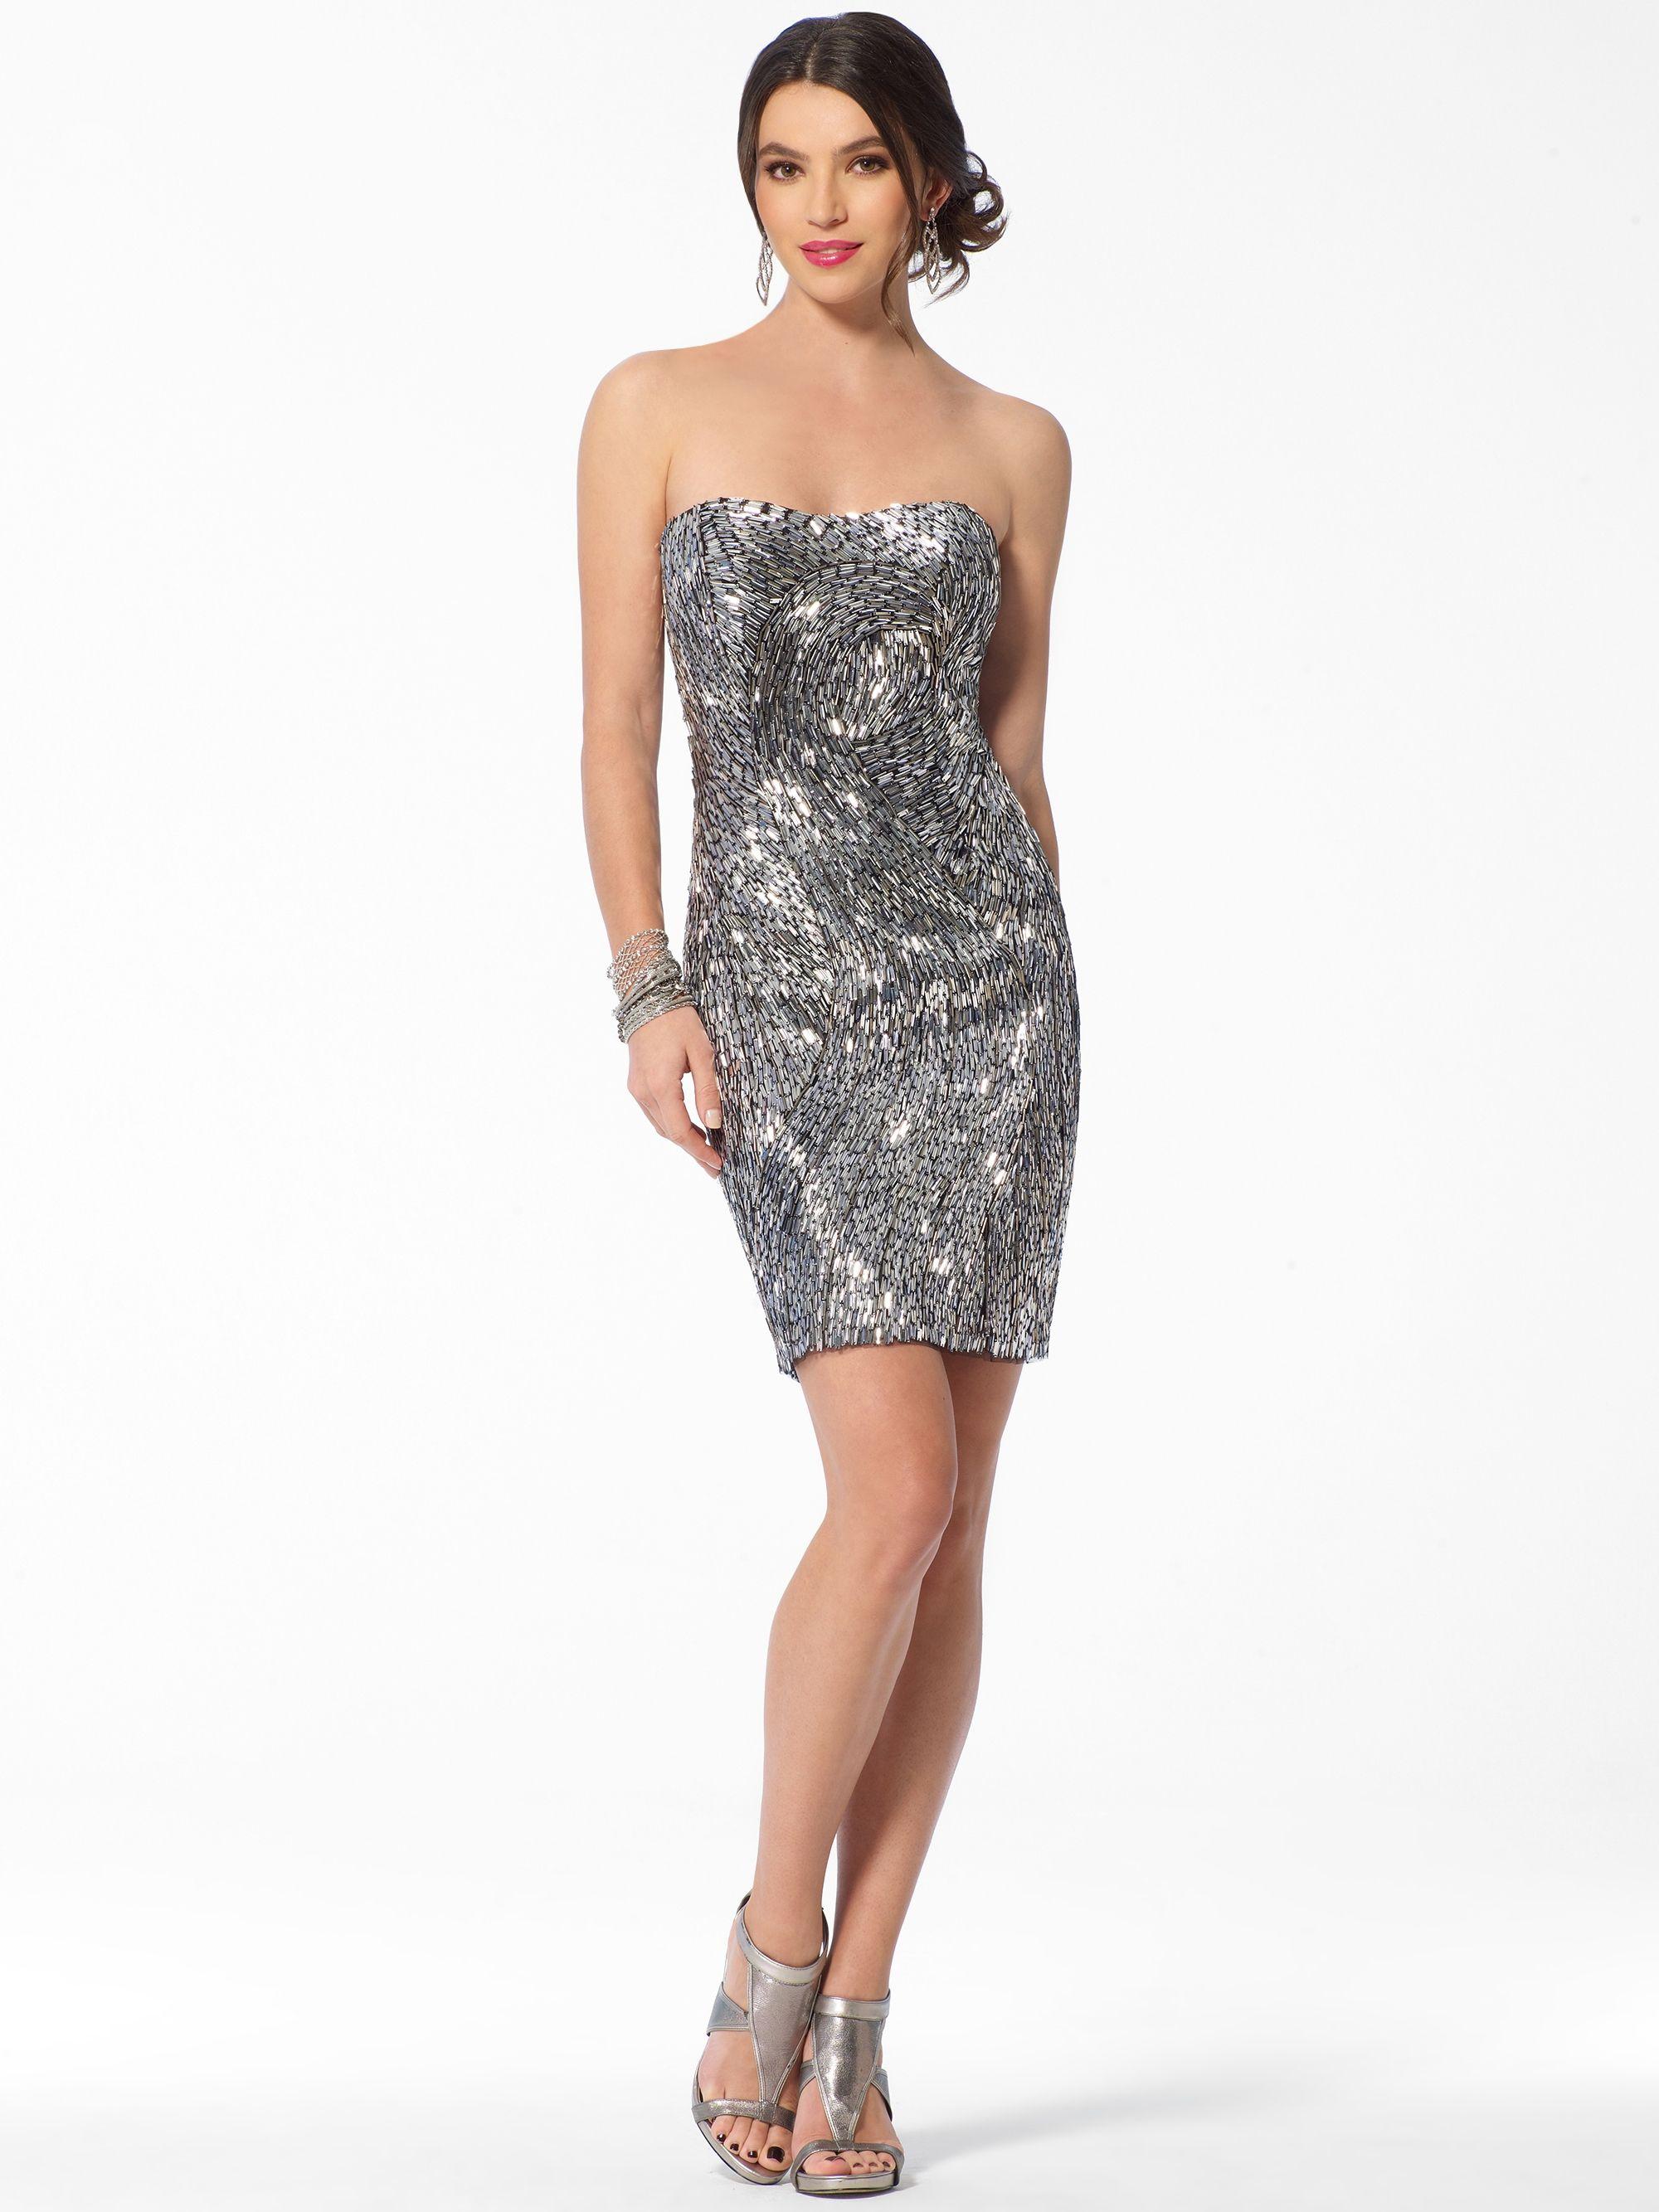 Stunning Sparkle Cocktail Dress | Silver Strapless Sparkle Beaded ...